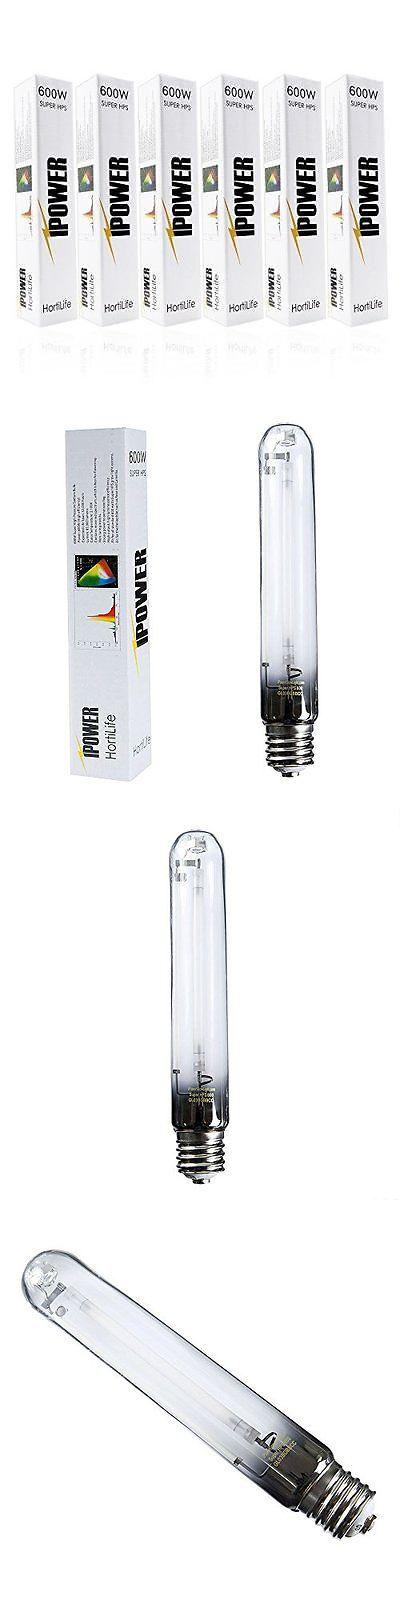 Grow Light Bulbs 178988: Ipower 6-Pack 600 Watt High Pressure Sodium Super Hps Grow Light Lamp Bulb New -> BUY IT NOW ONLY: $129.19 on eBay!